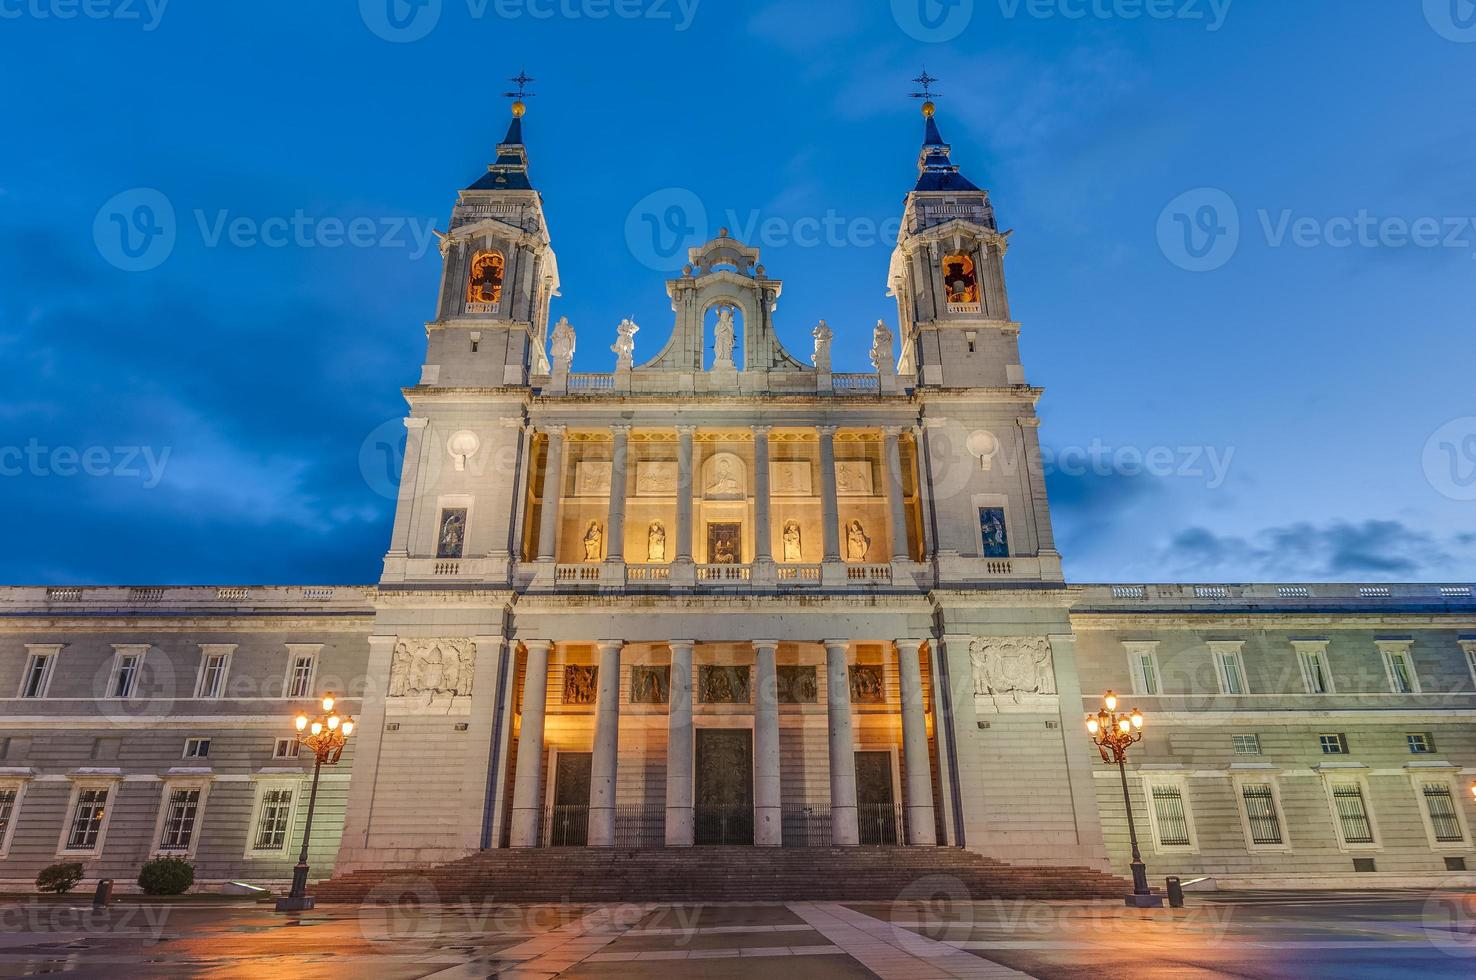 Almudena Kathedrale in Madrid, Spanien. foto